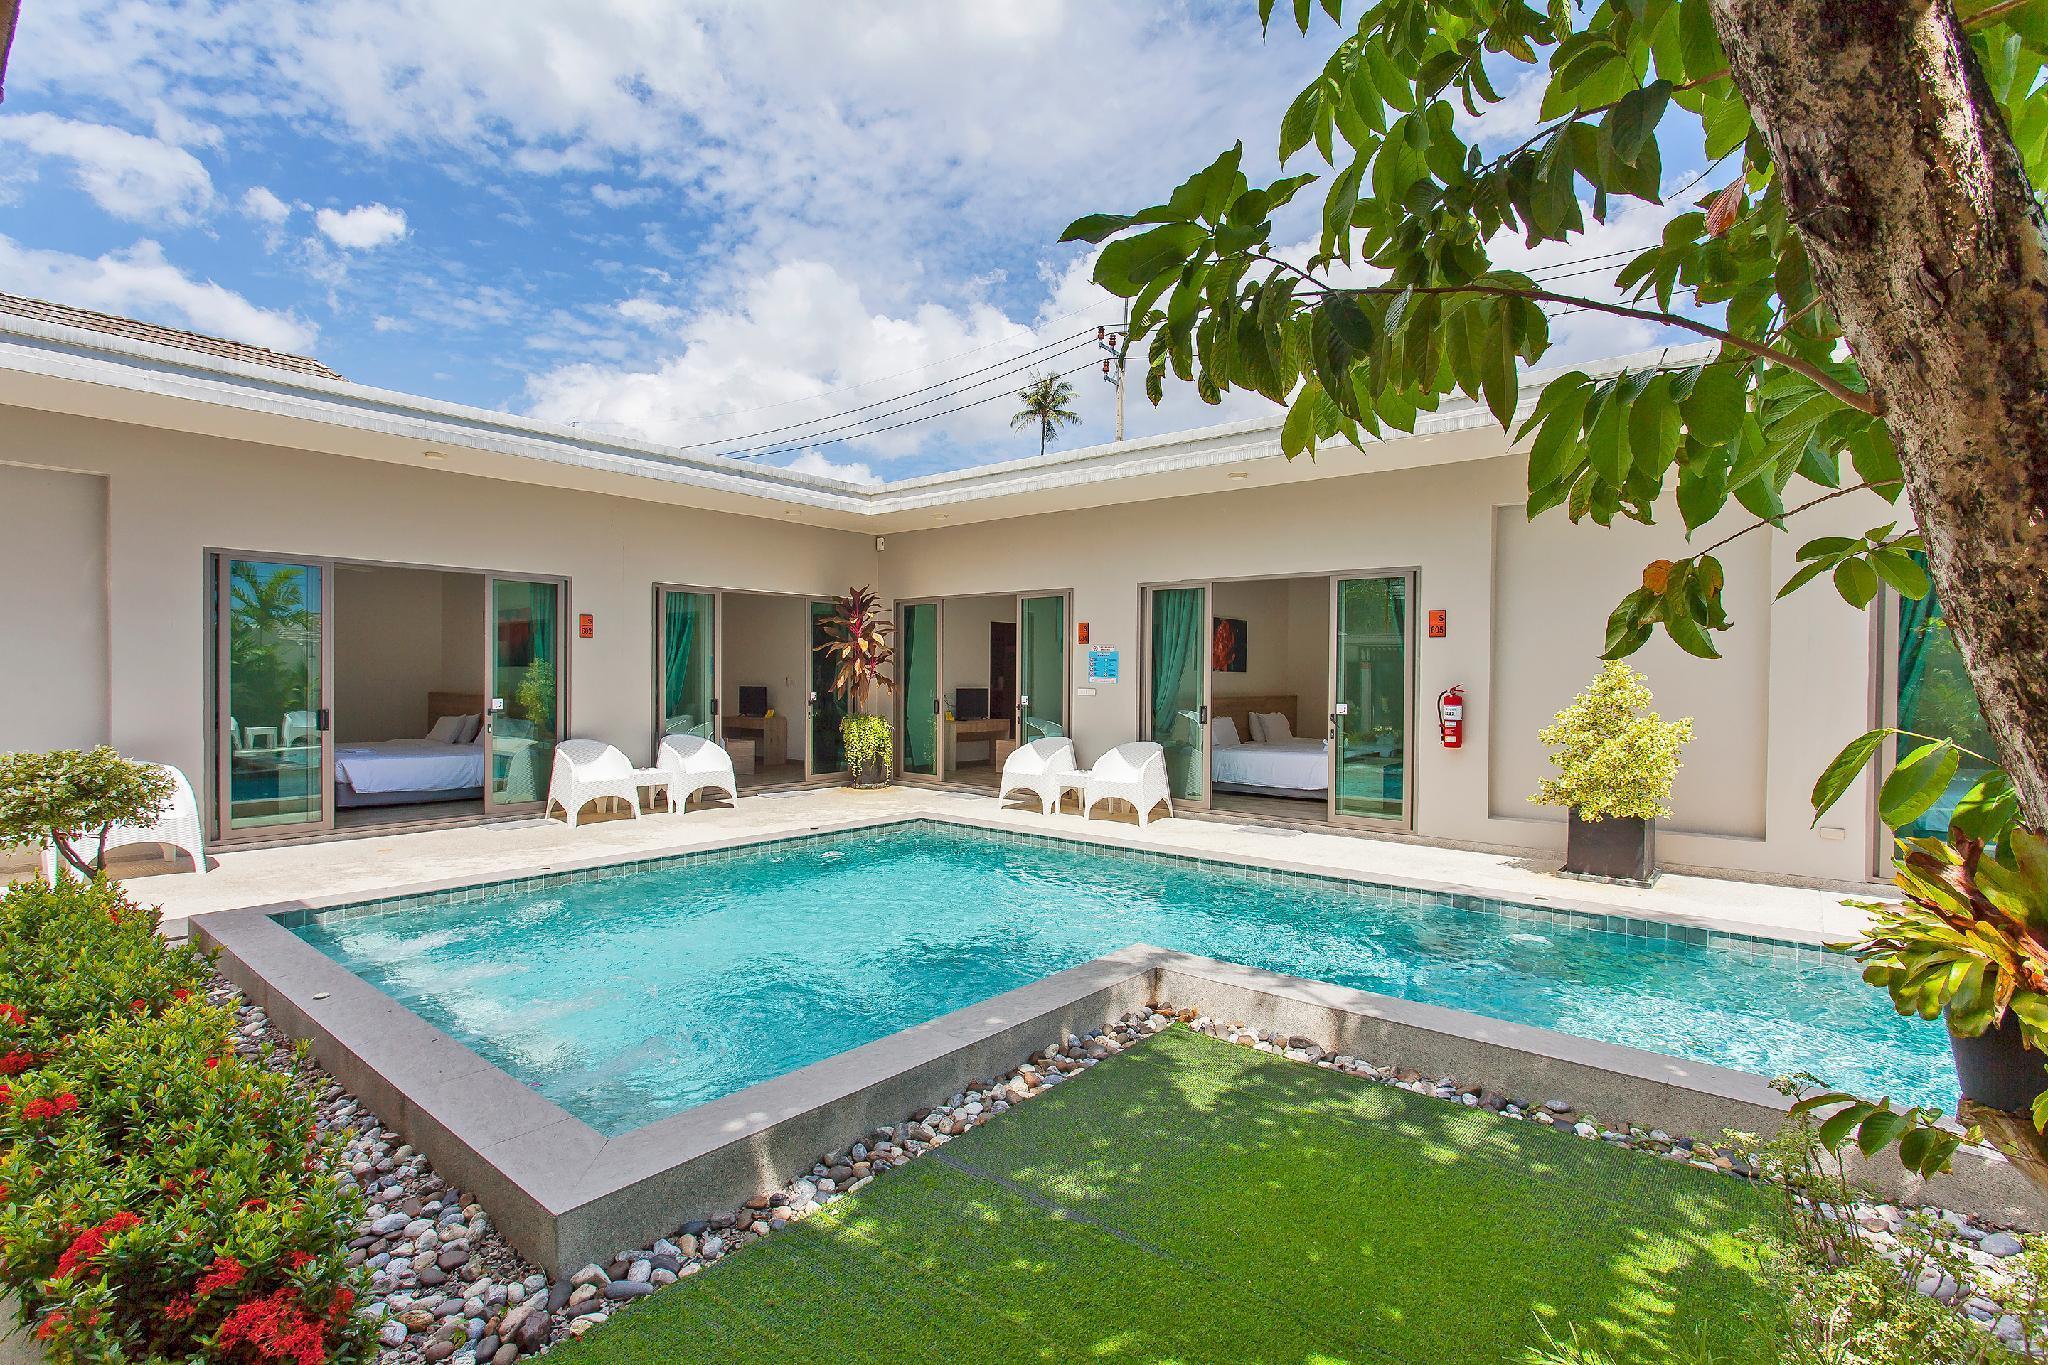 ⭐Modern Getaway Villa 6BR Sleeps 12 w/Private Pool วิลลา 6 ห้องนอน 6 ห้องน้ำส่วนตัว ขนาด 8000 ตร.ม. – บางเทา